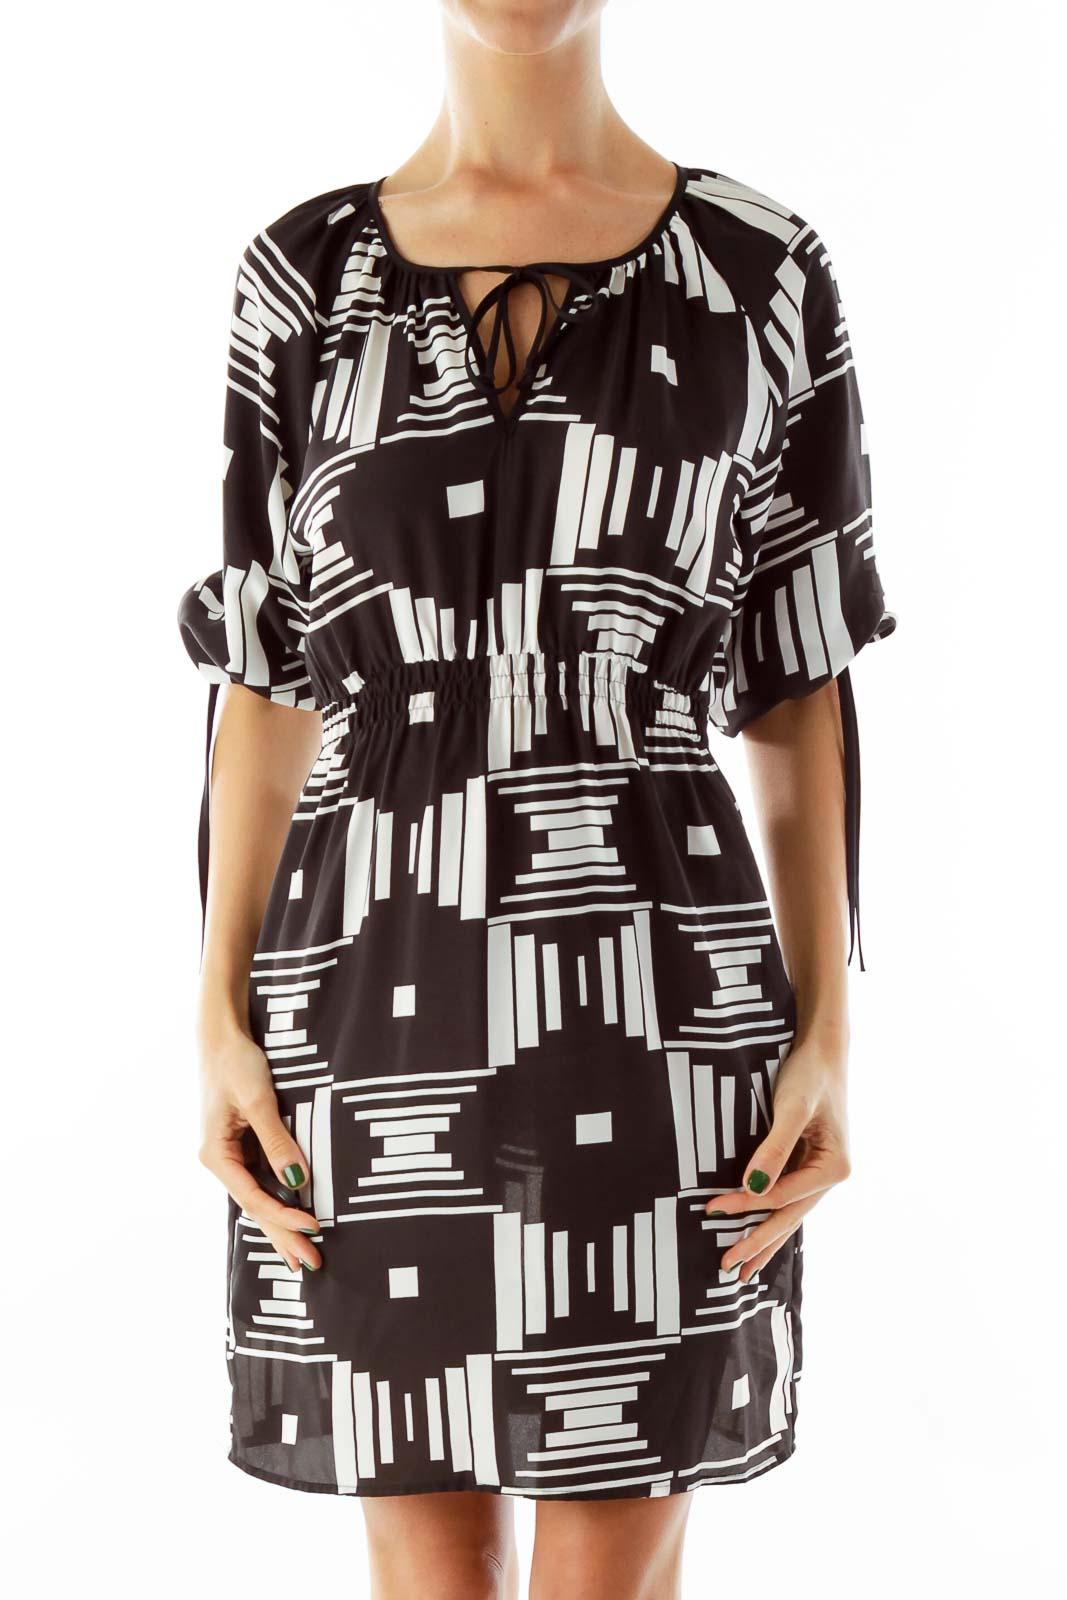 Black & White Aztec Print Dress Front